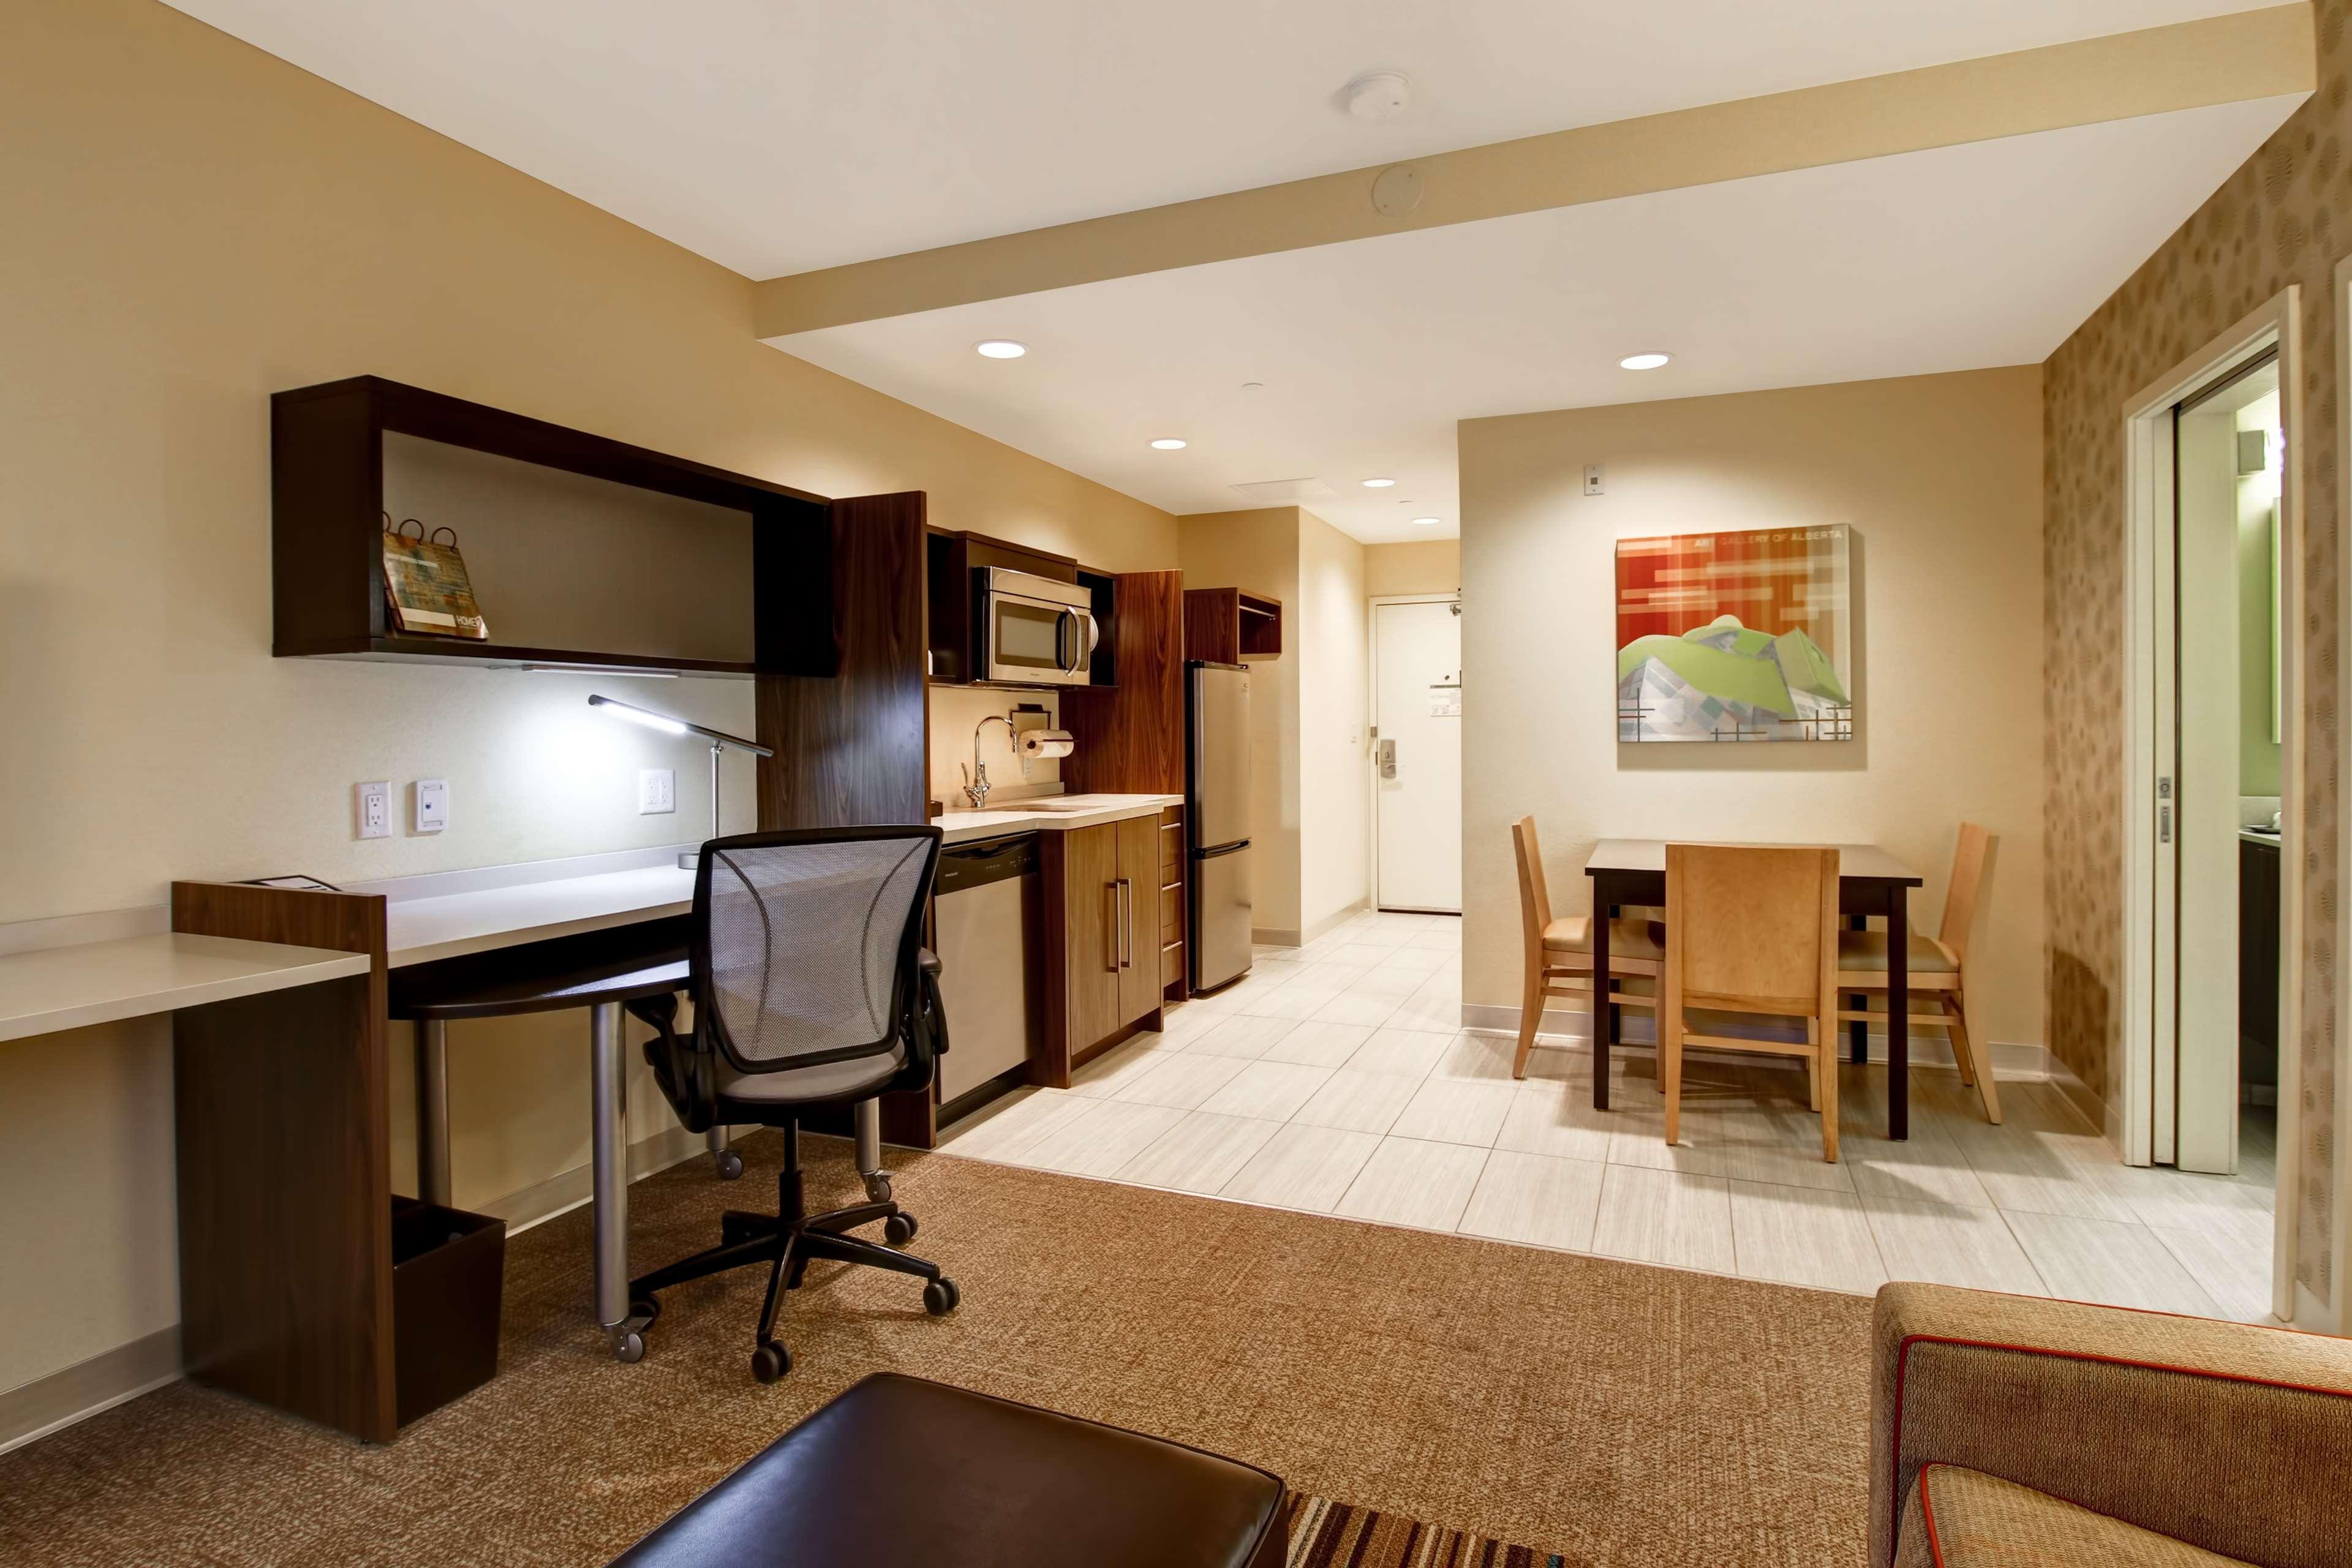 Home2 Suites by Hilton West Edmonton, Alberta, Canada in Edmonton: Guest room